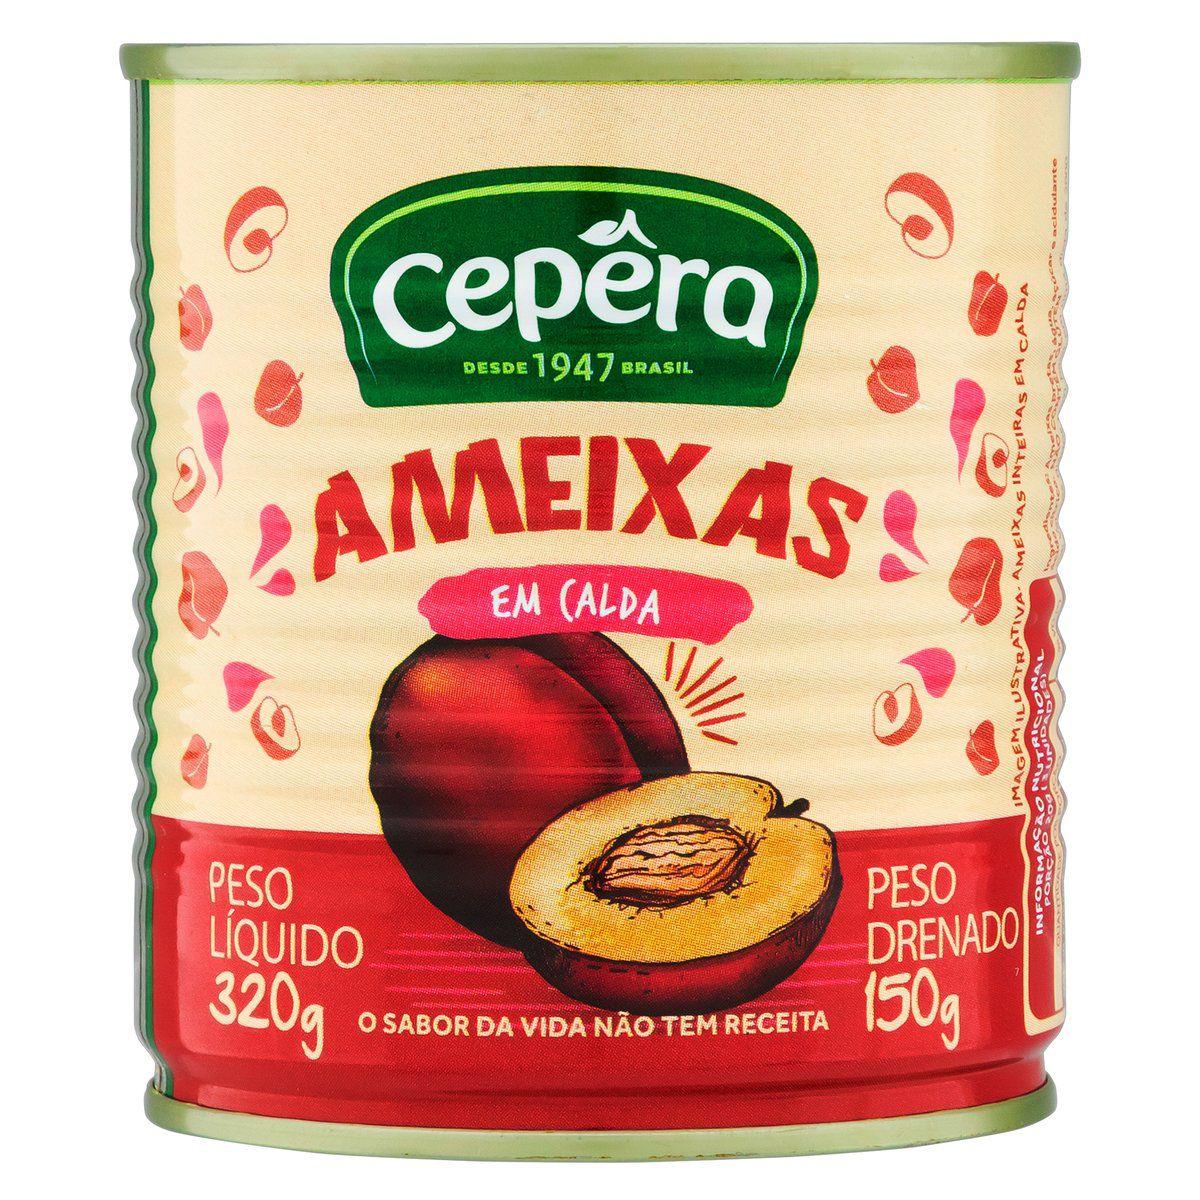 AMEIXAS EM CALDA CEPERA LT 1x150g